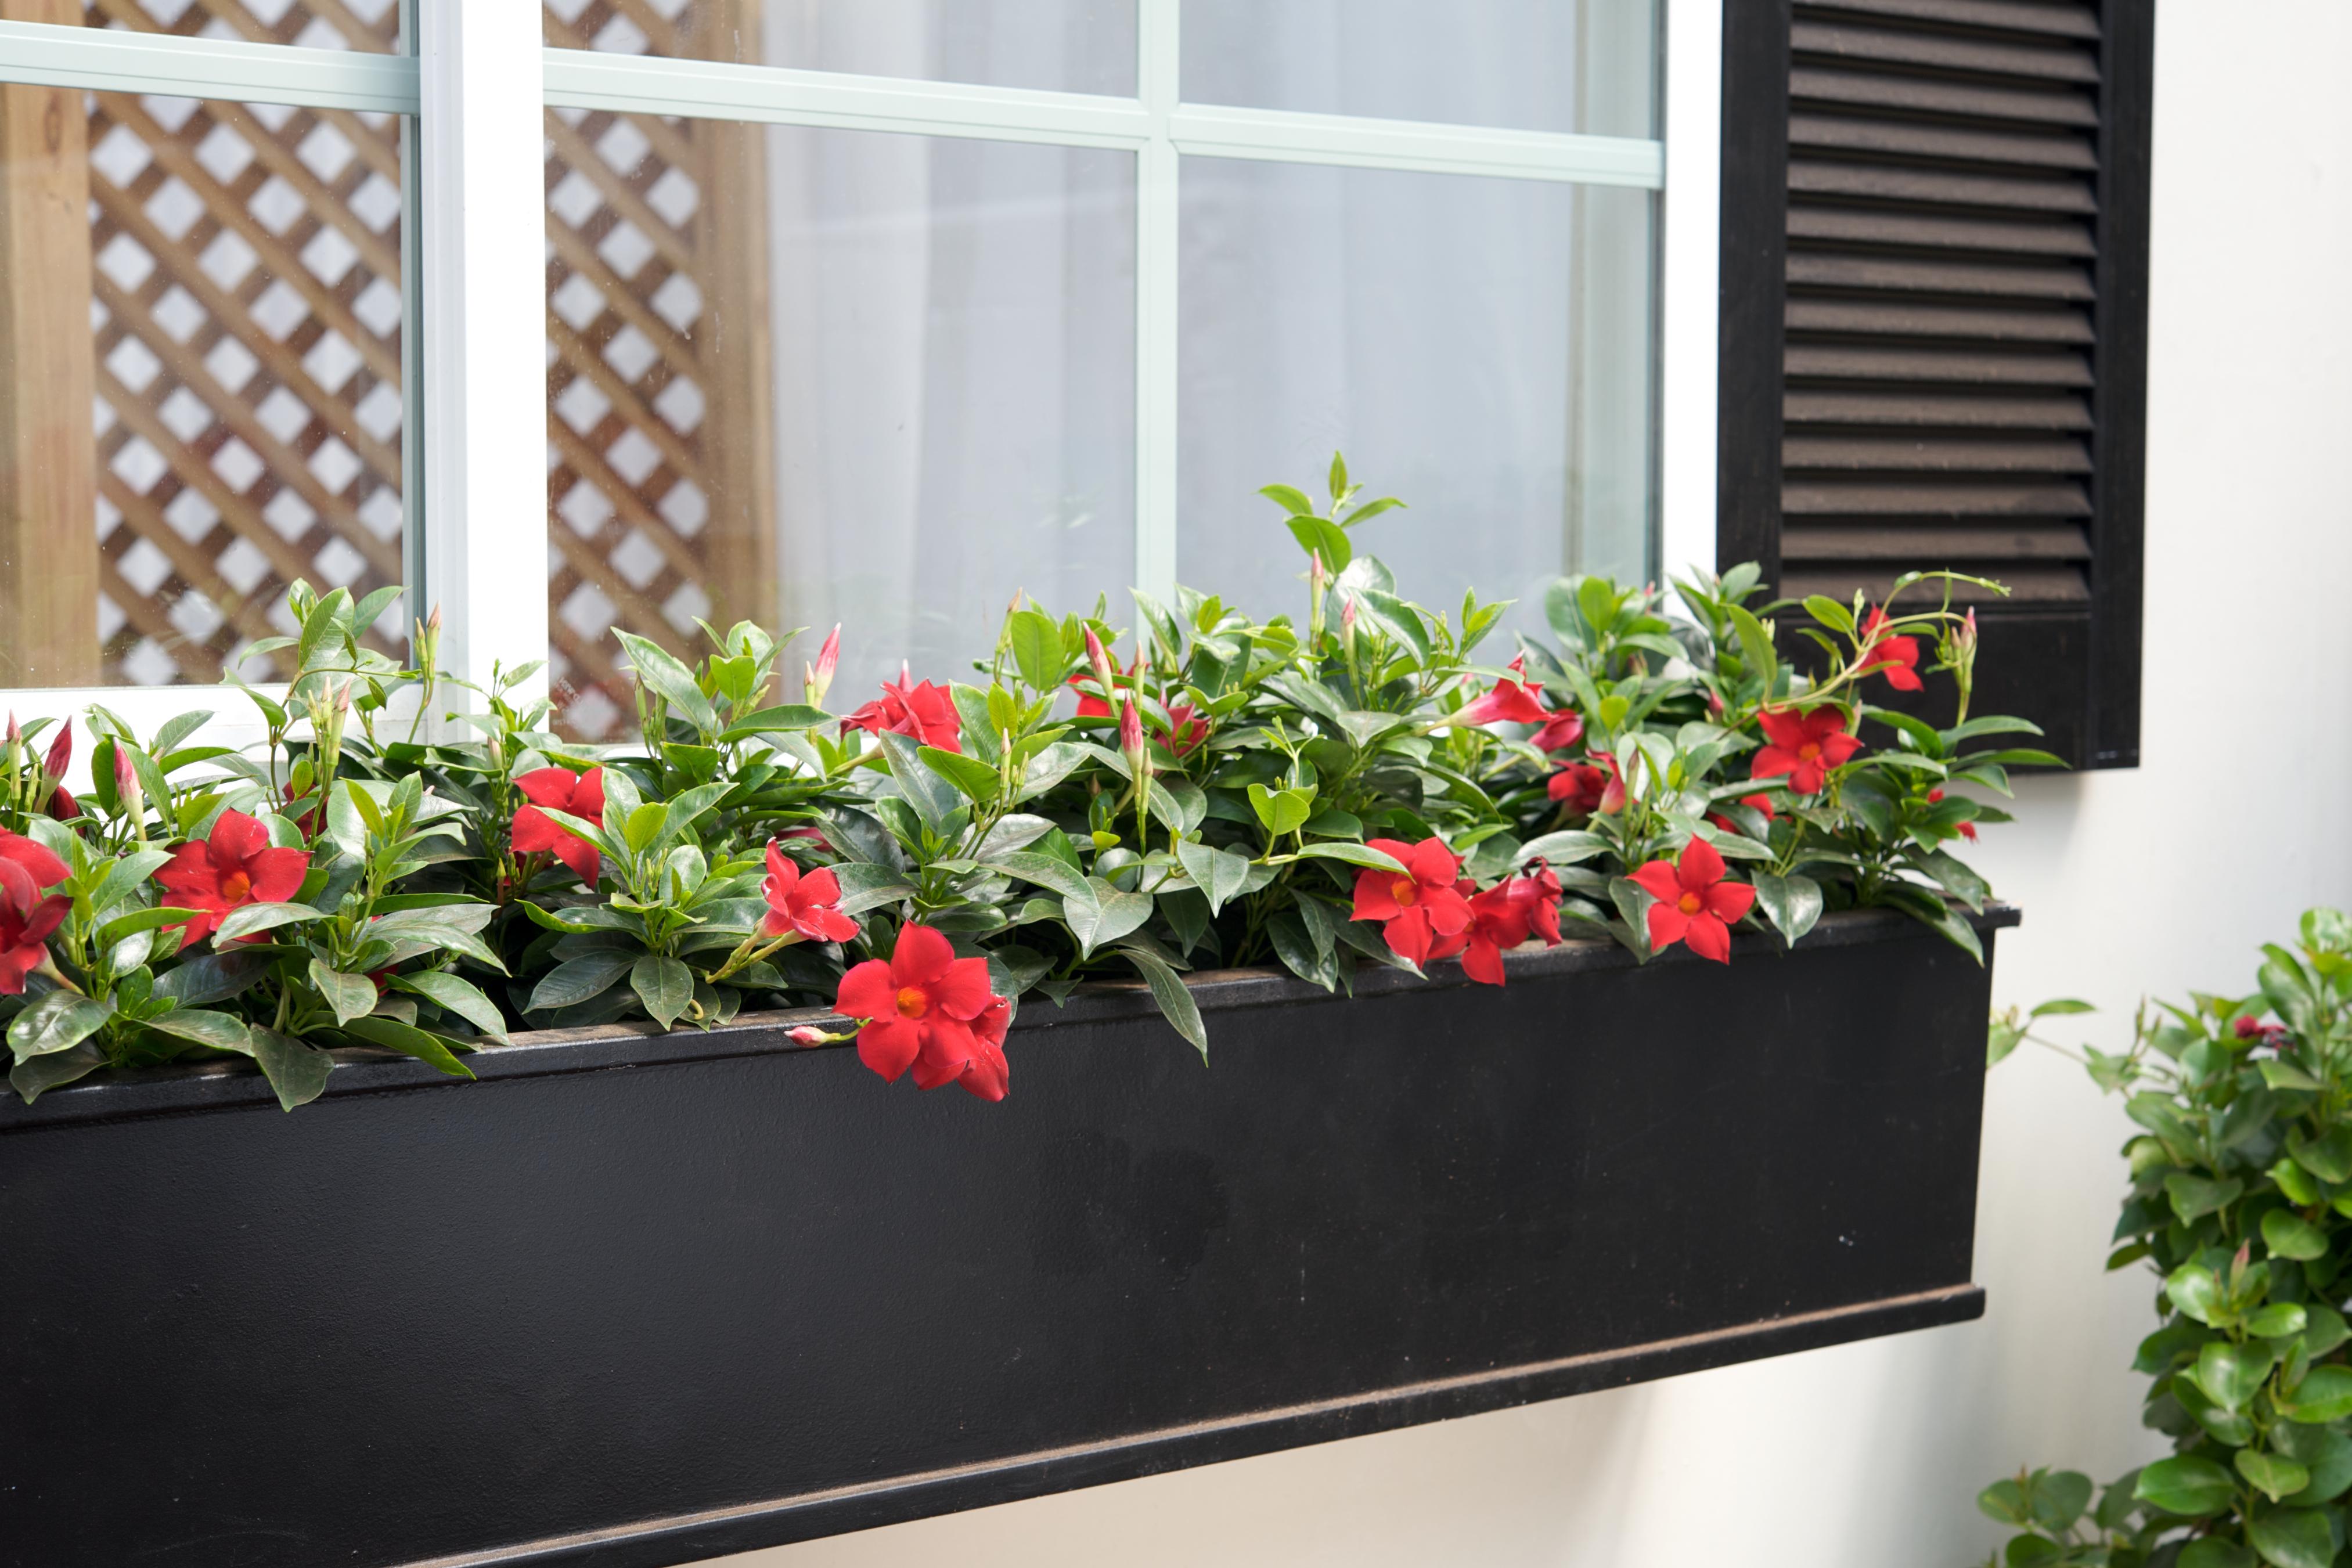 Sun Parasol Garden Crimson mandevilla complimenting black window box planter.